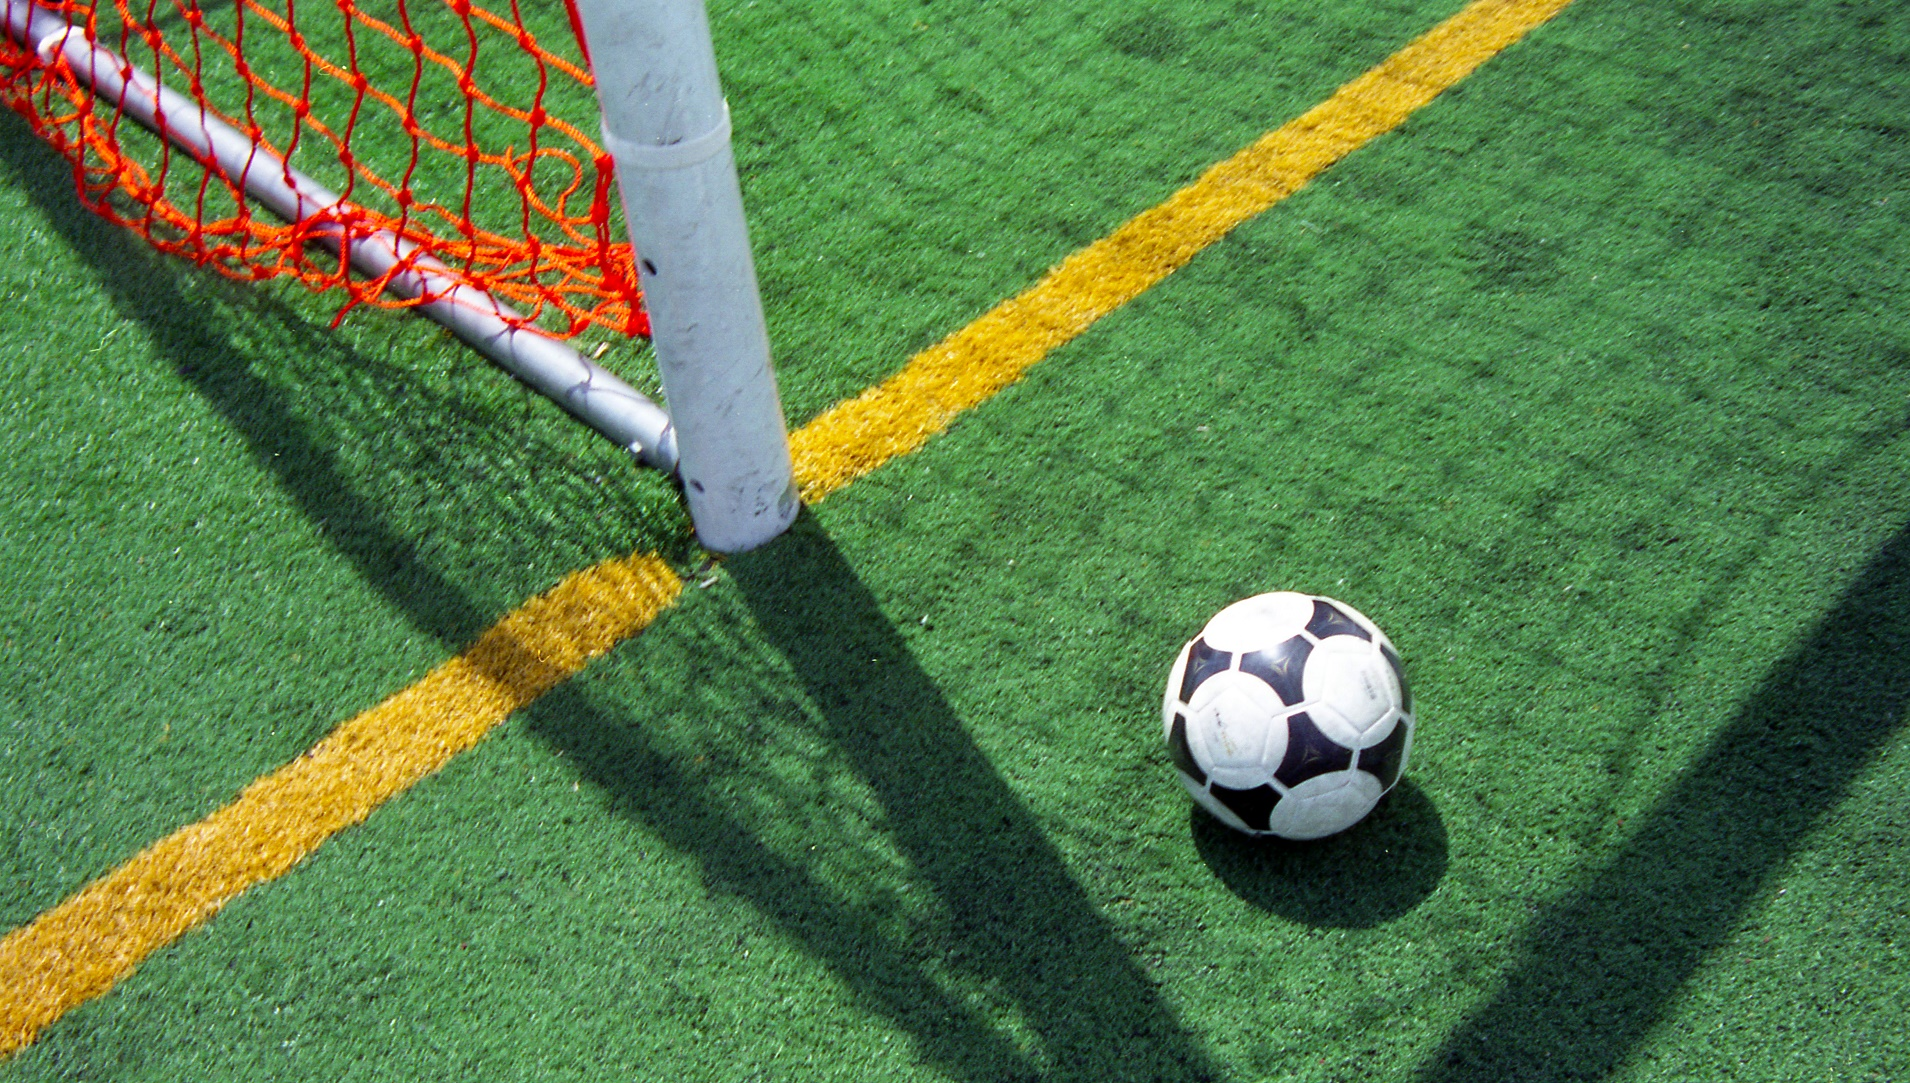 Érase un sensor dentro del balón de fútbol: un nuevo nivel de información